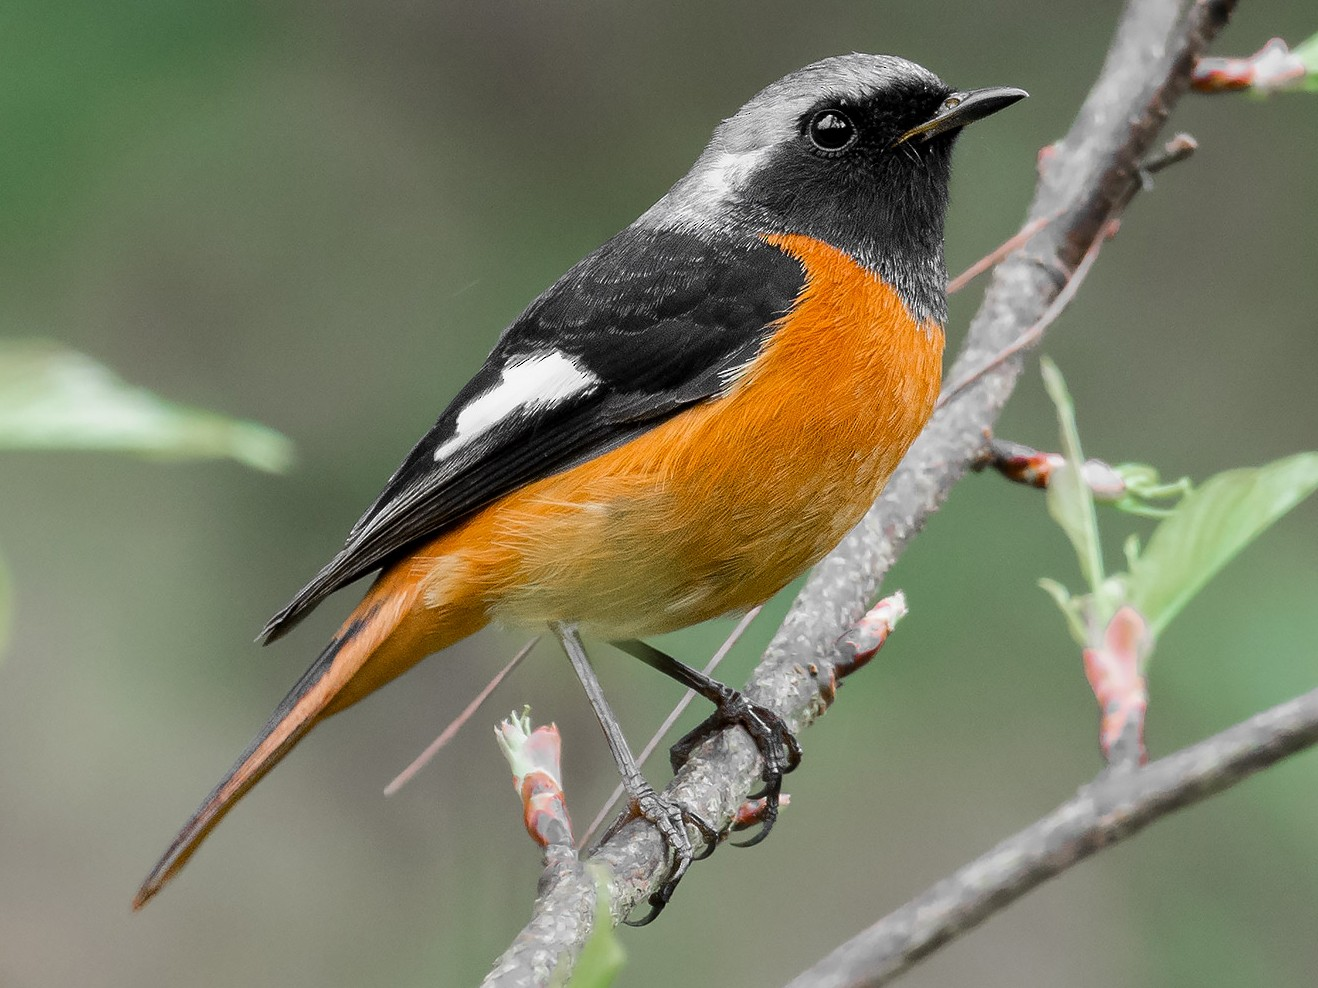 Daurian Redstart - Natthaphat Chotjuckdikul